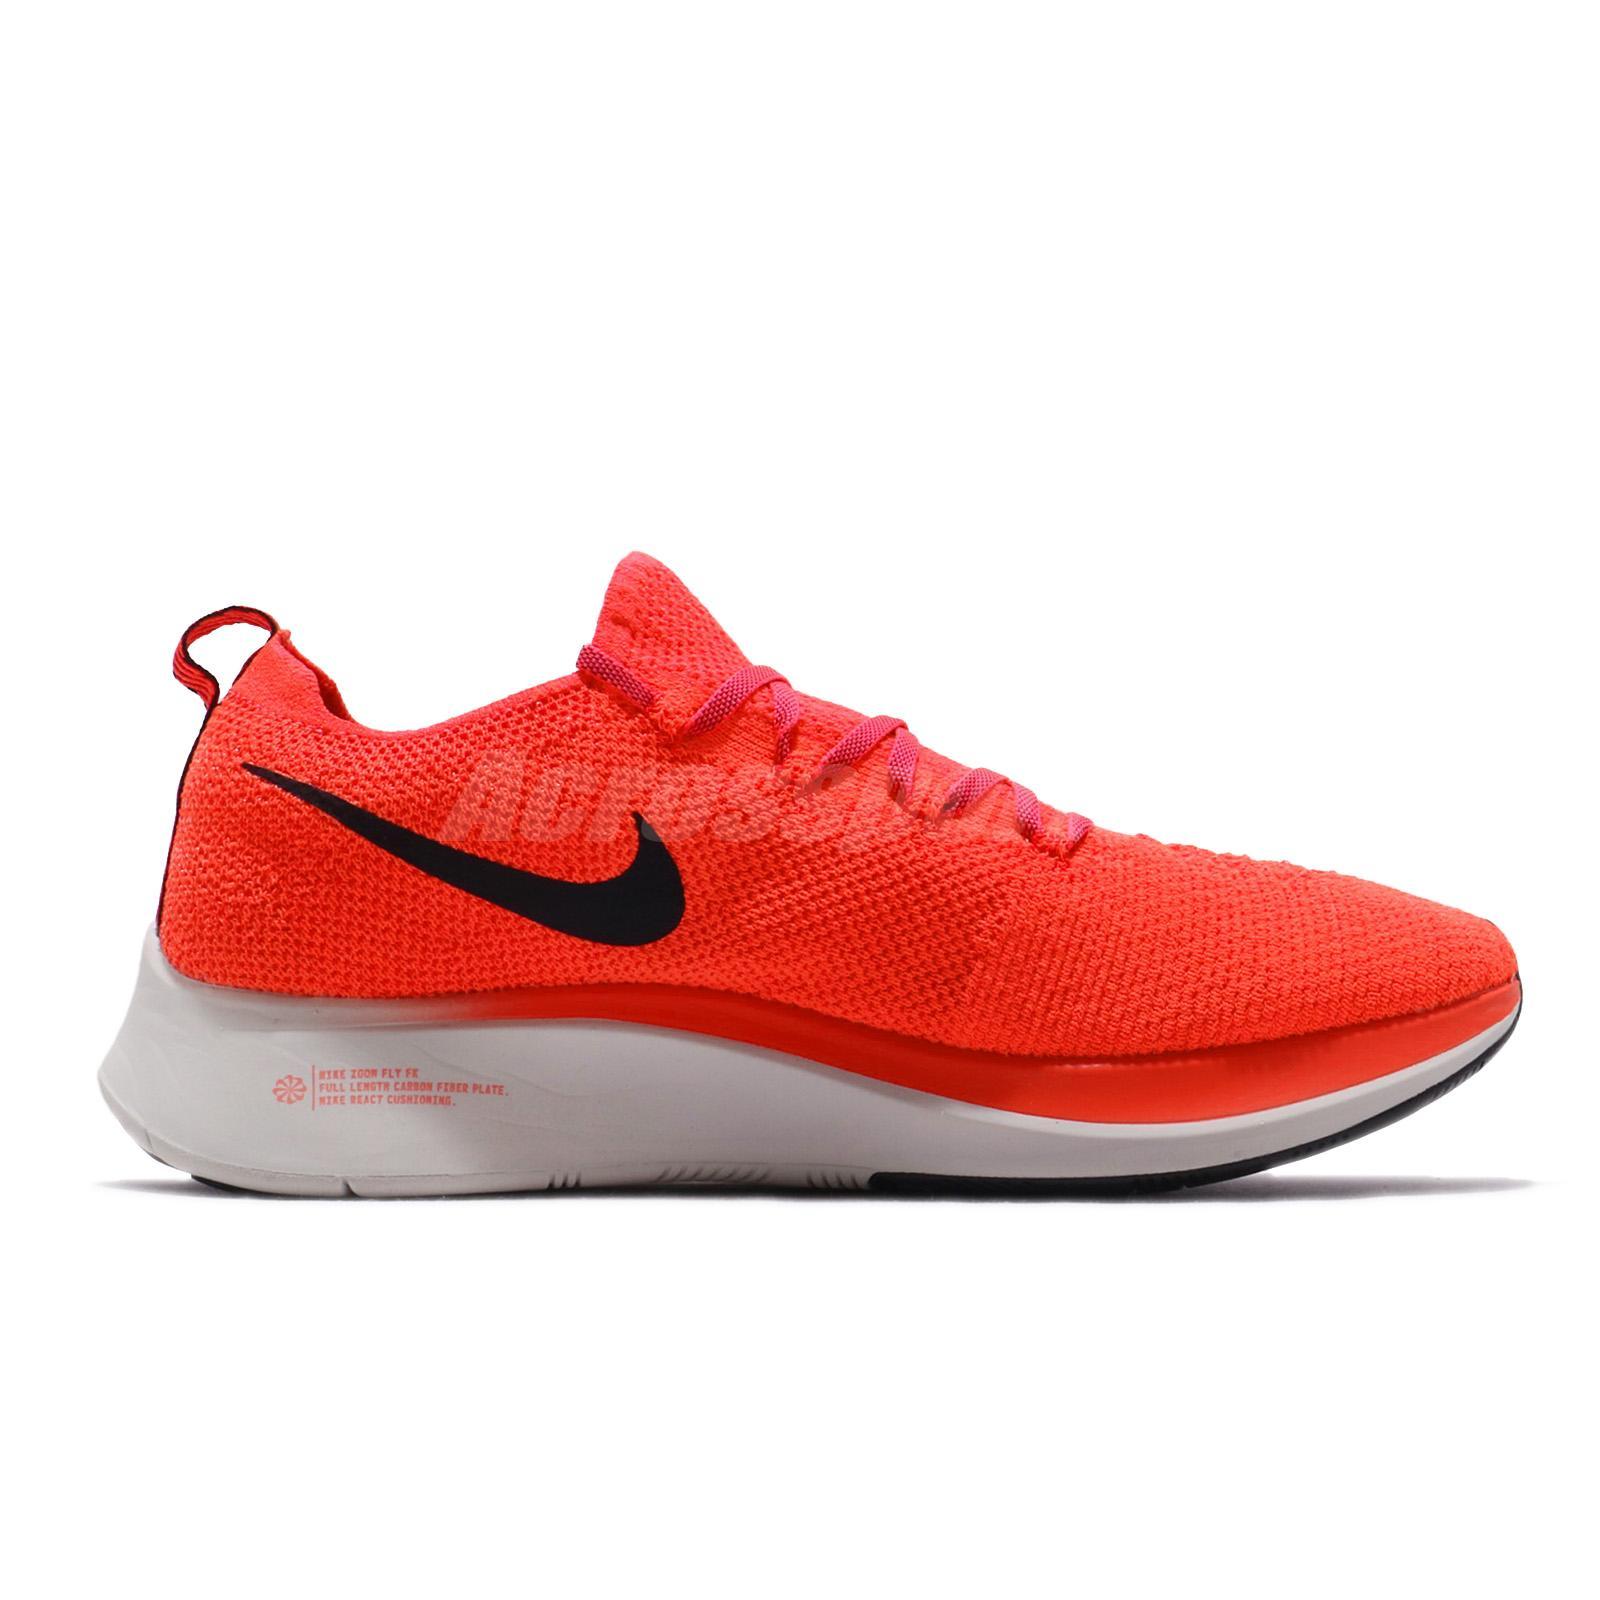 7bdd8be5cf2c Nike Zoom Fly FK Flyknit Bright Crimson Black Men Running Shoes ...